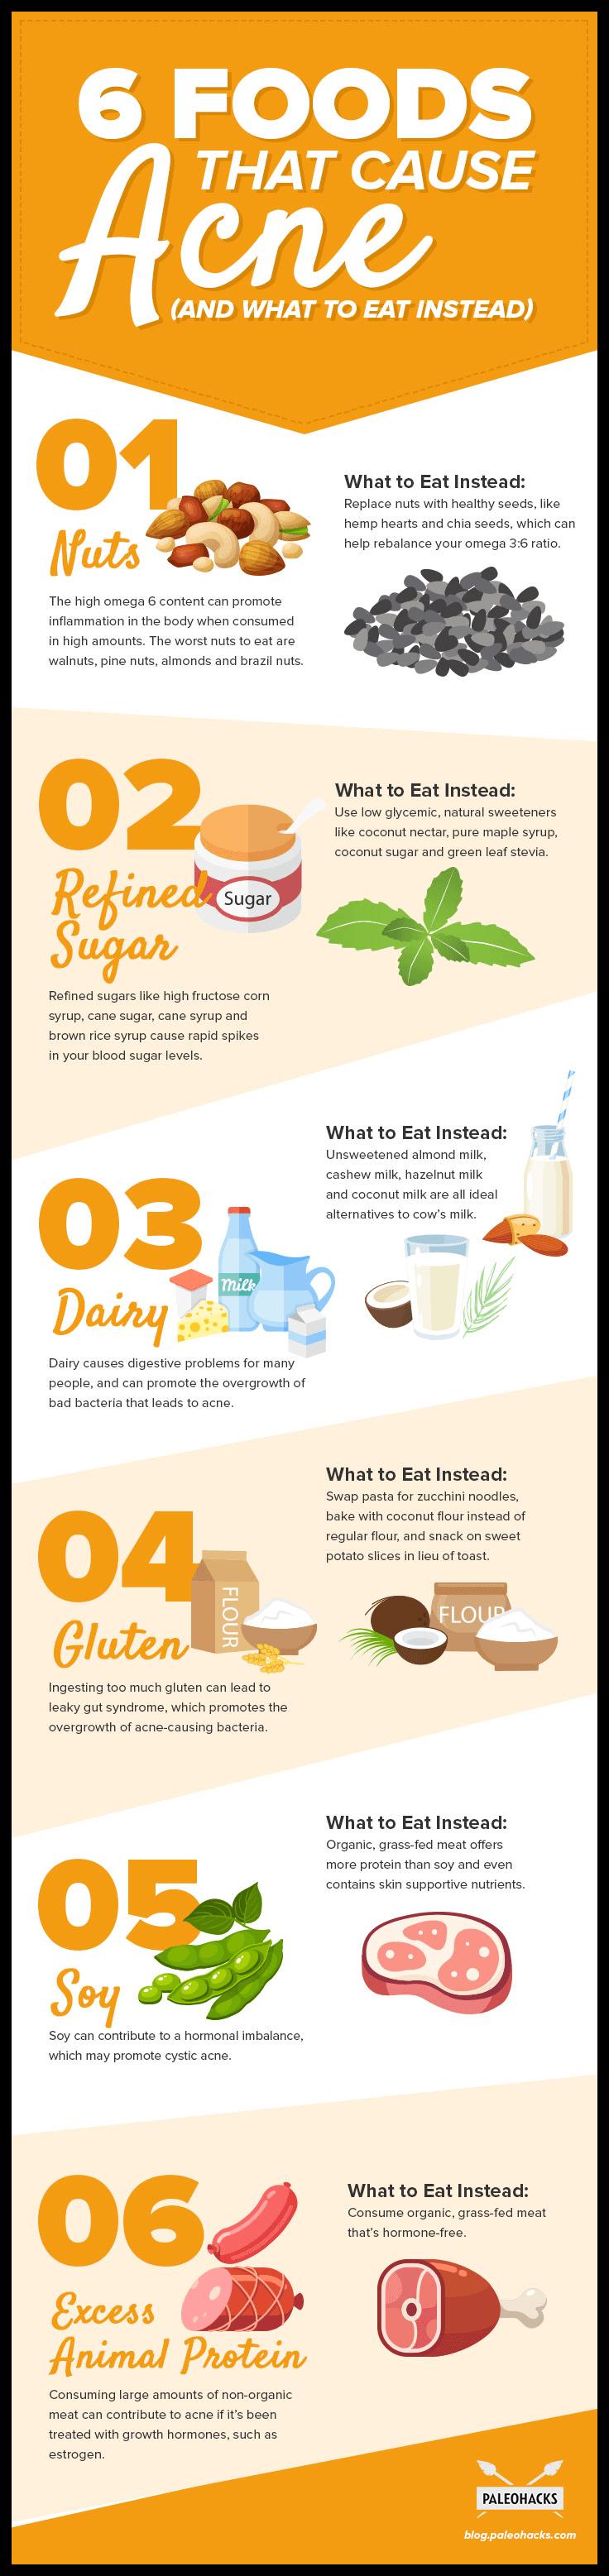 Best Skin Foods To Eat